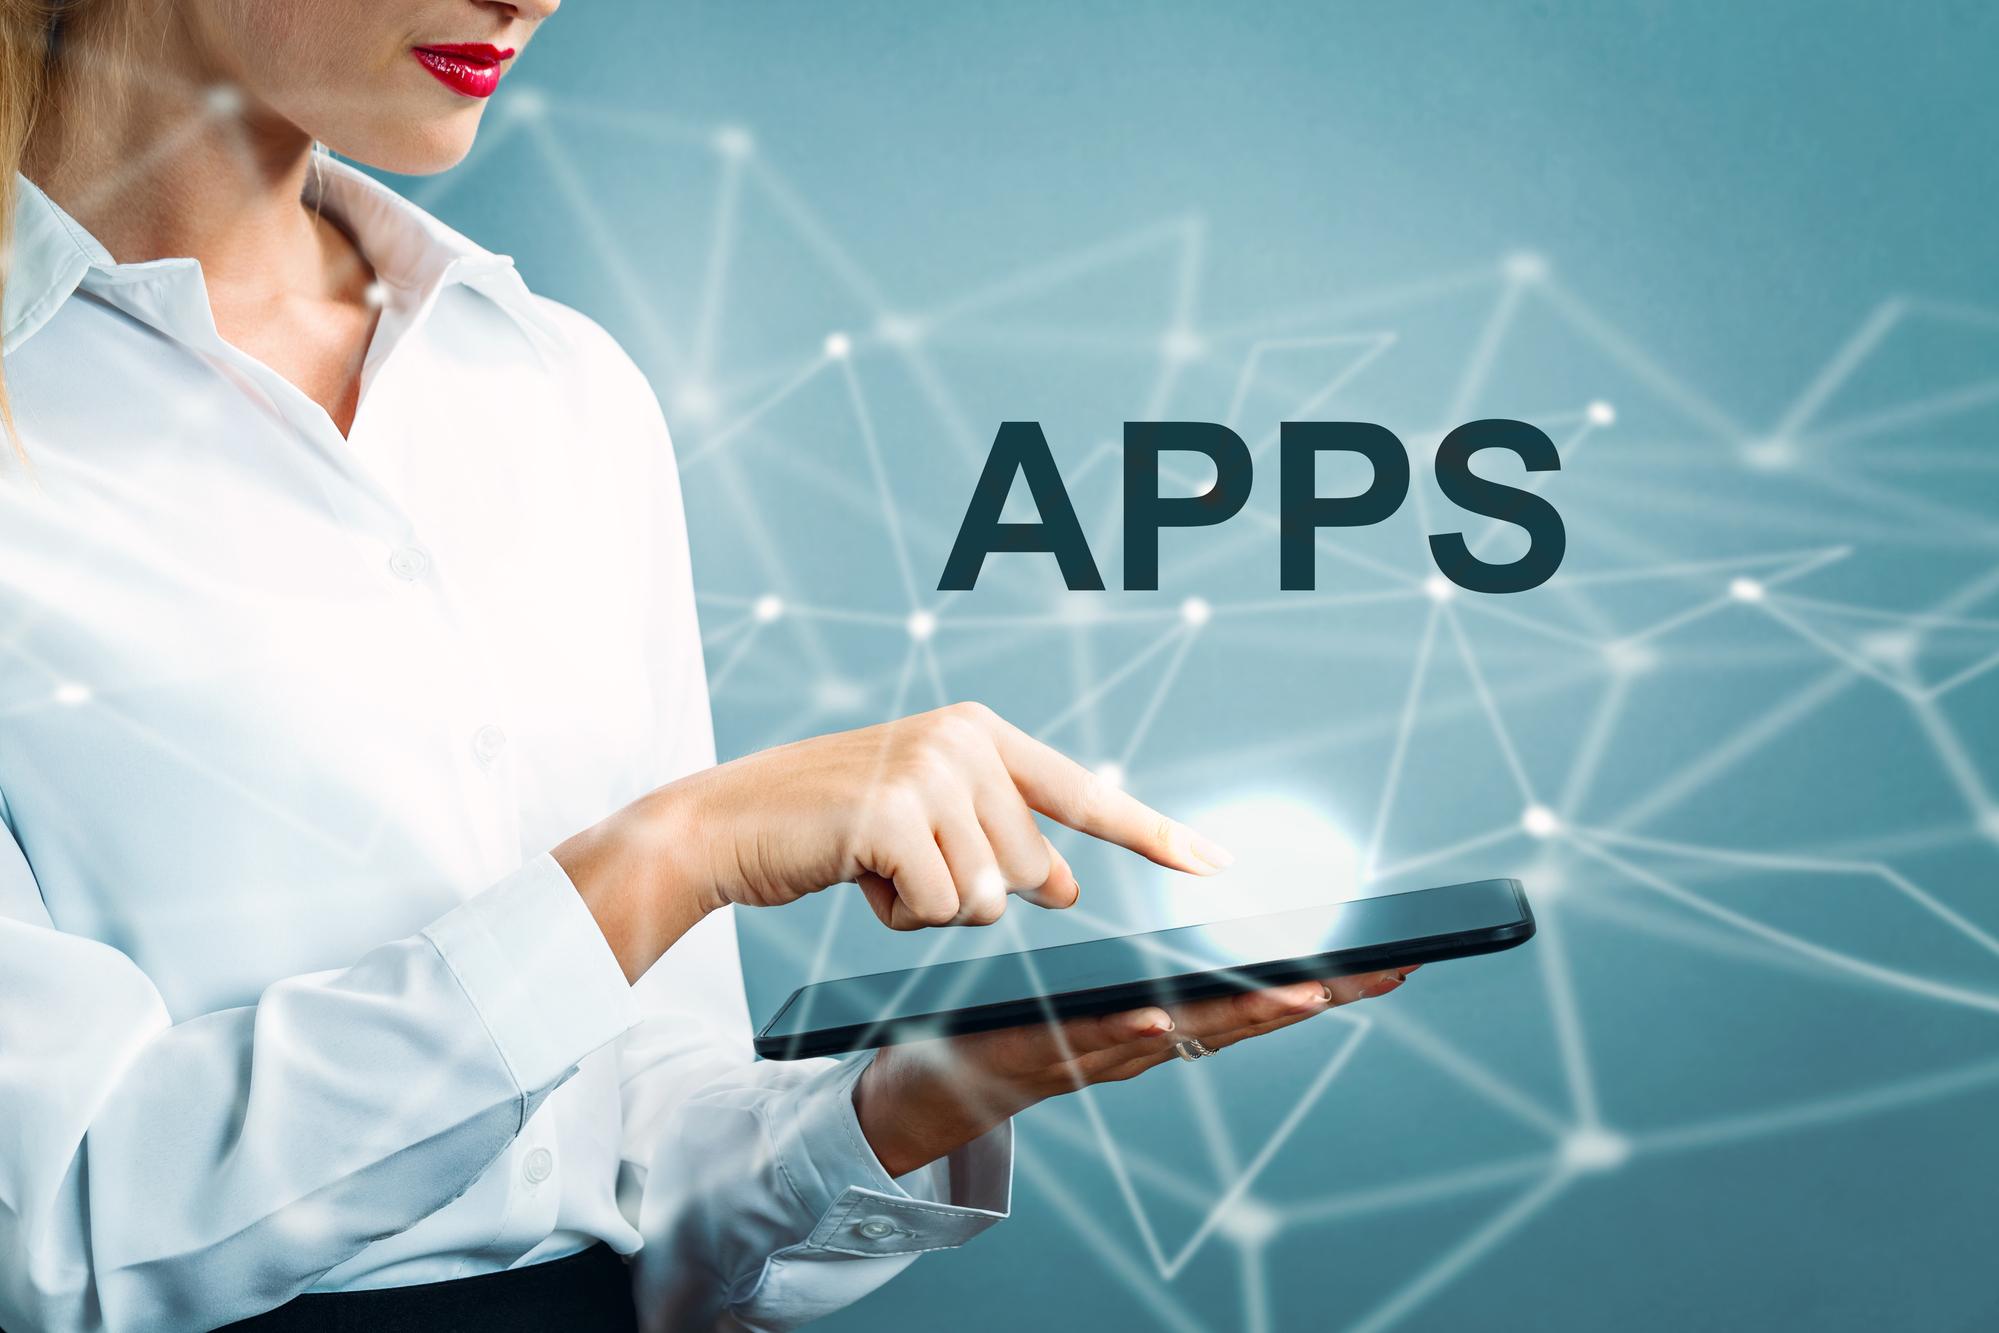 New mobile app ideas 2019